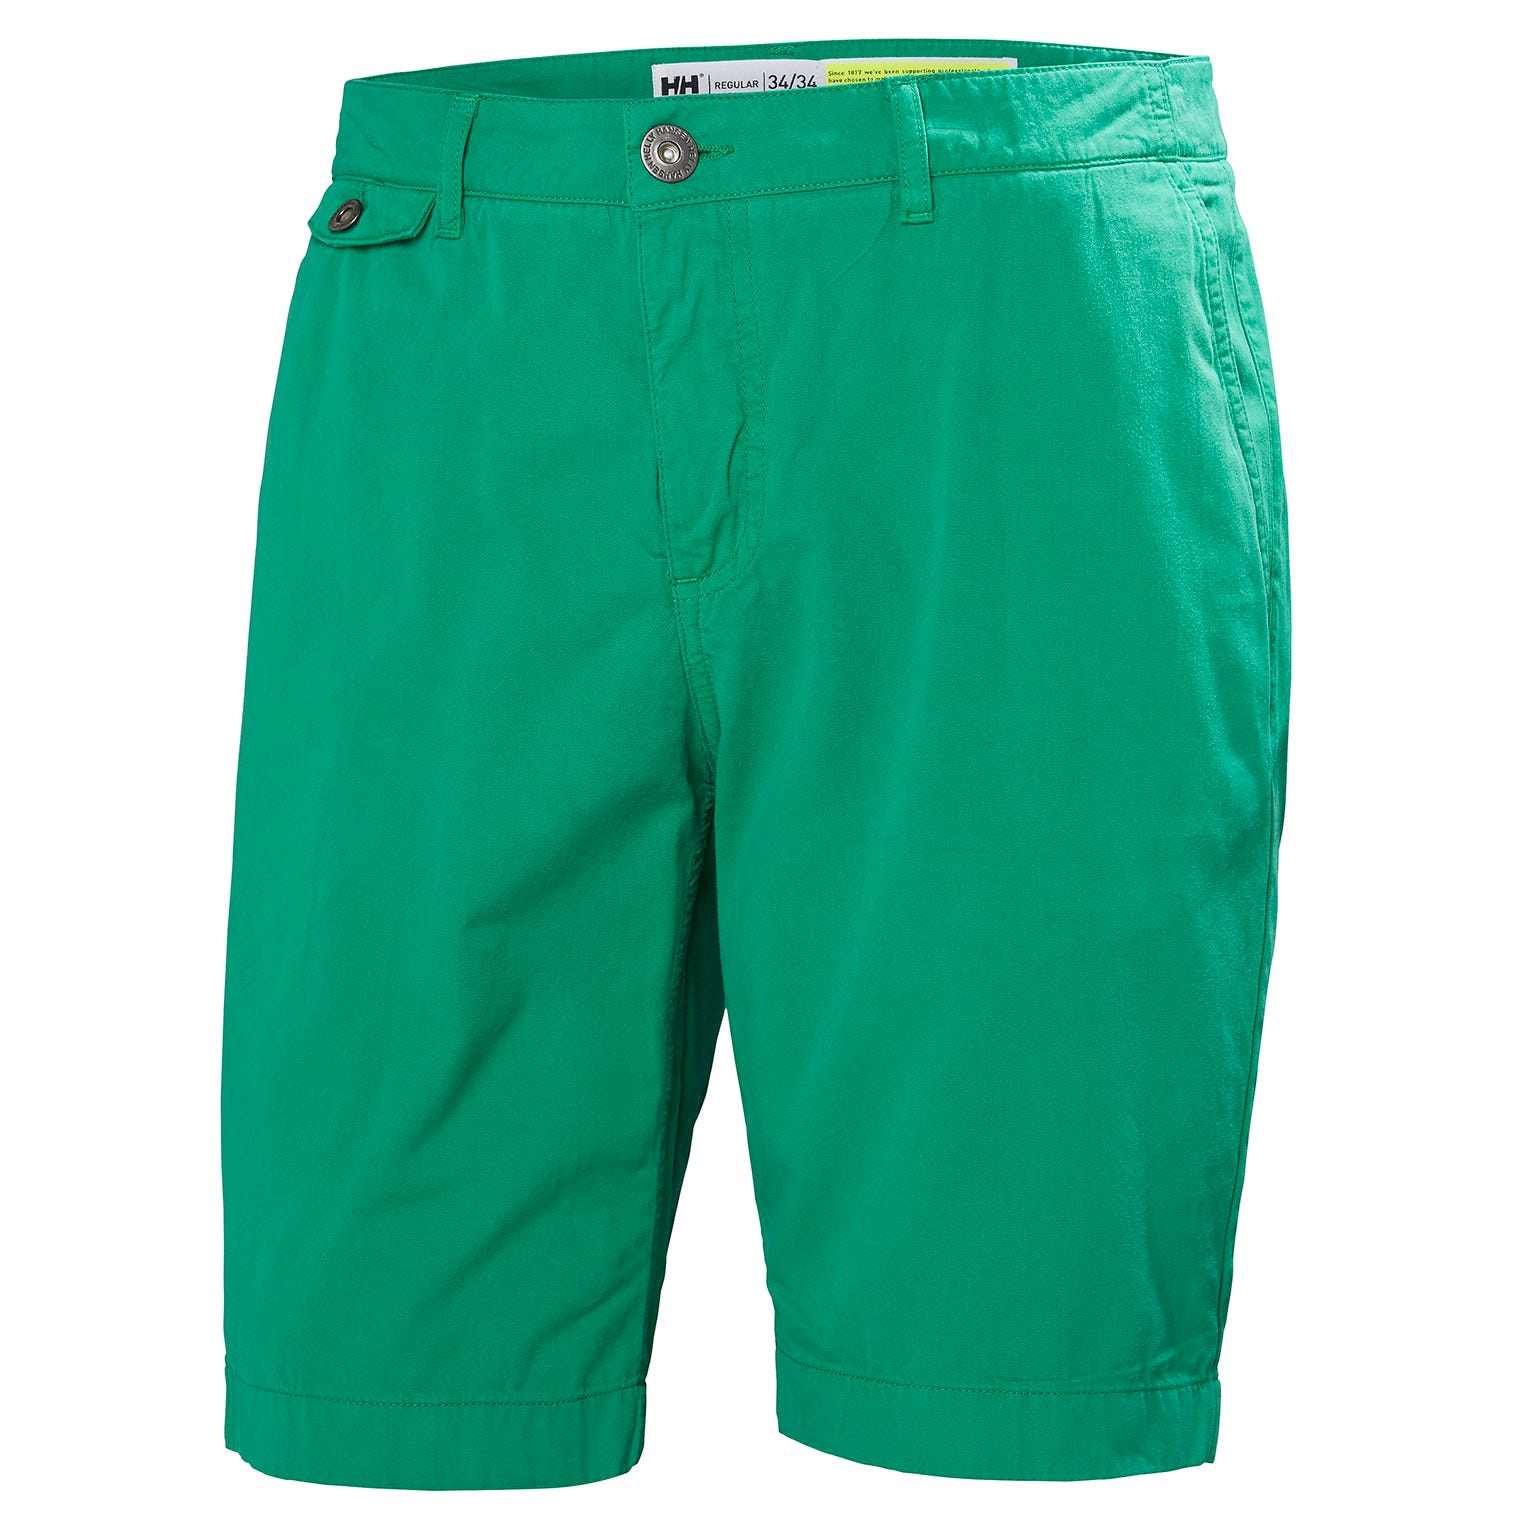 Acerbis Bermuda Sp Club Shorts Camo-Brun